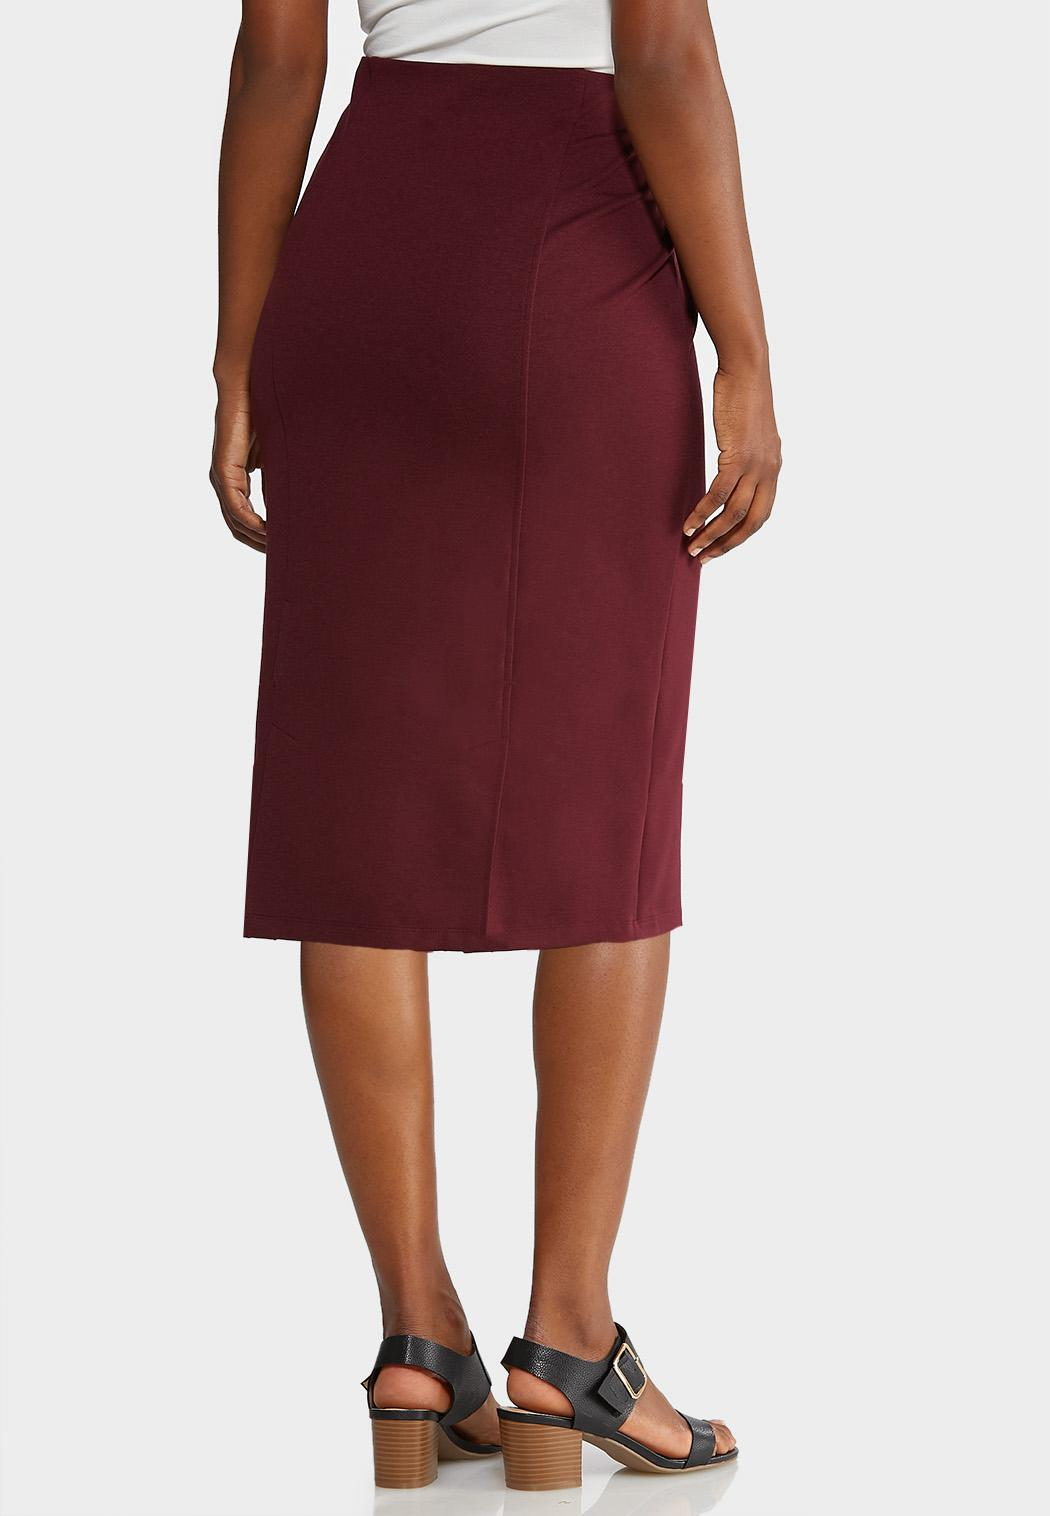 Plus Size Ponte Pull-On Pencil Skirt (Item #43916138)